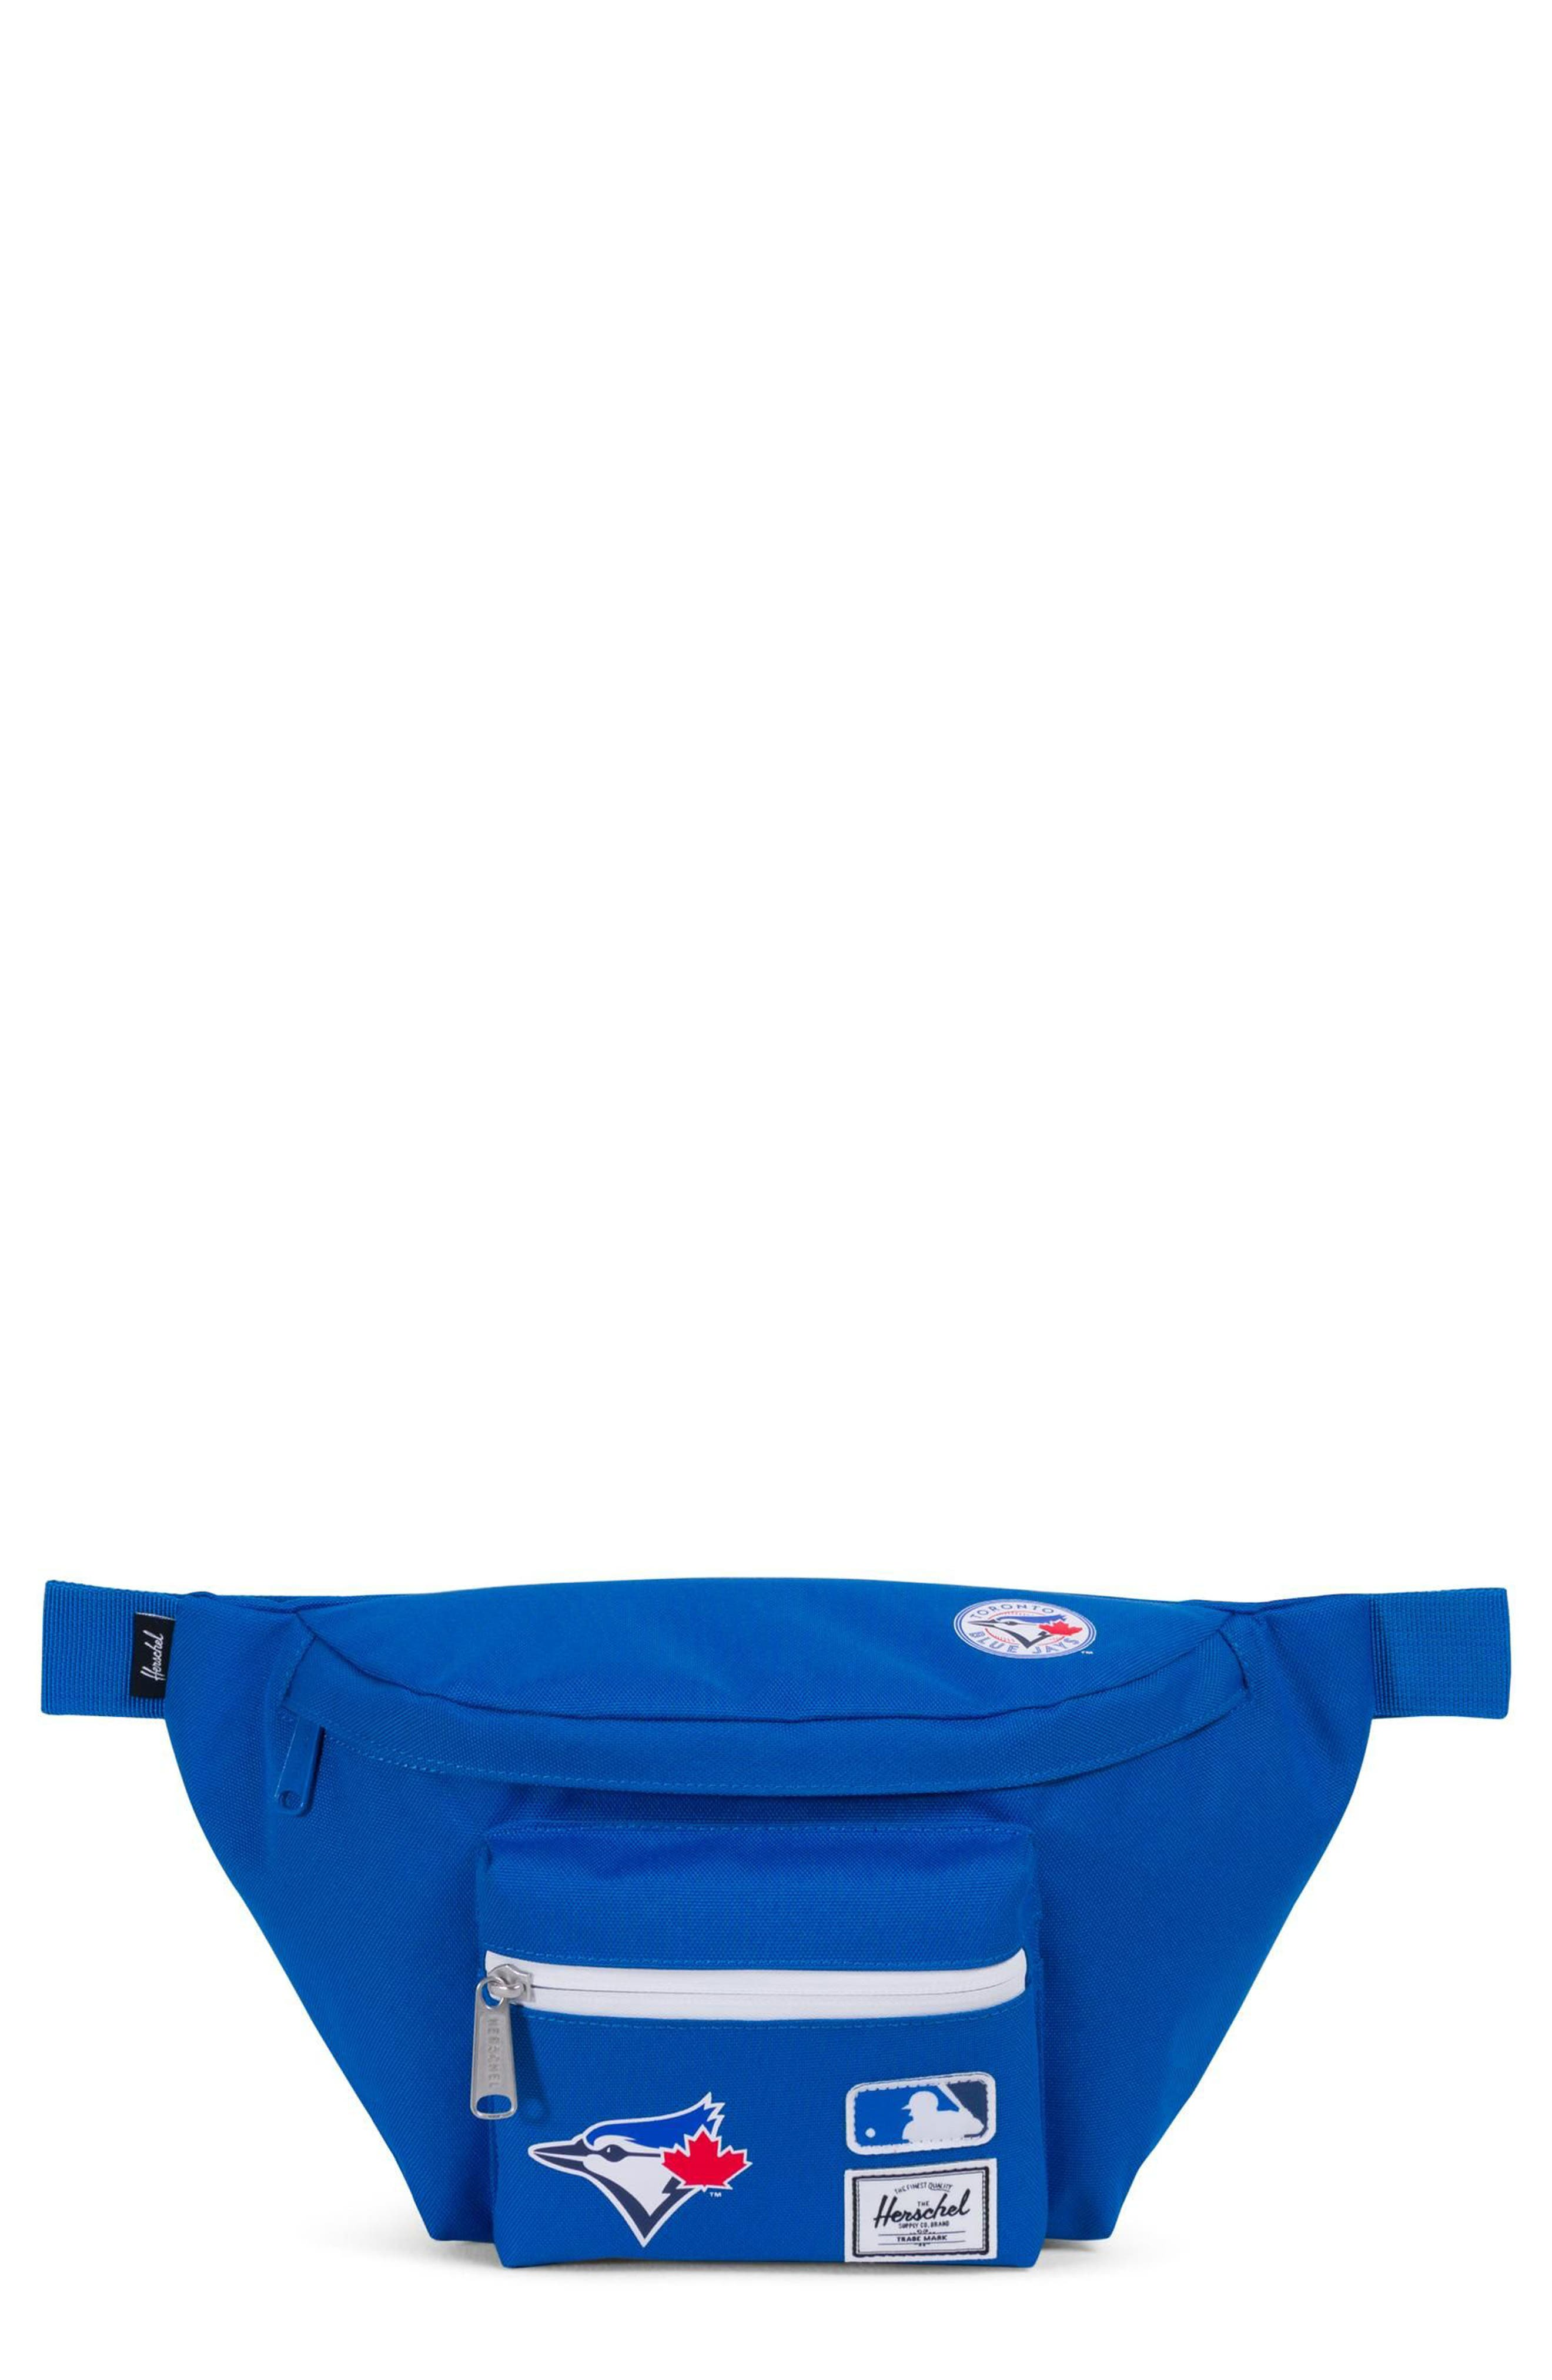 Herschel Supply Co. MLB American League Hip Pack